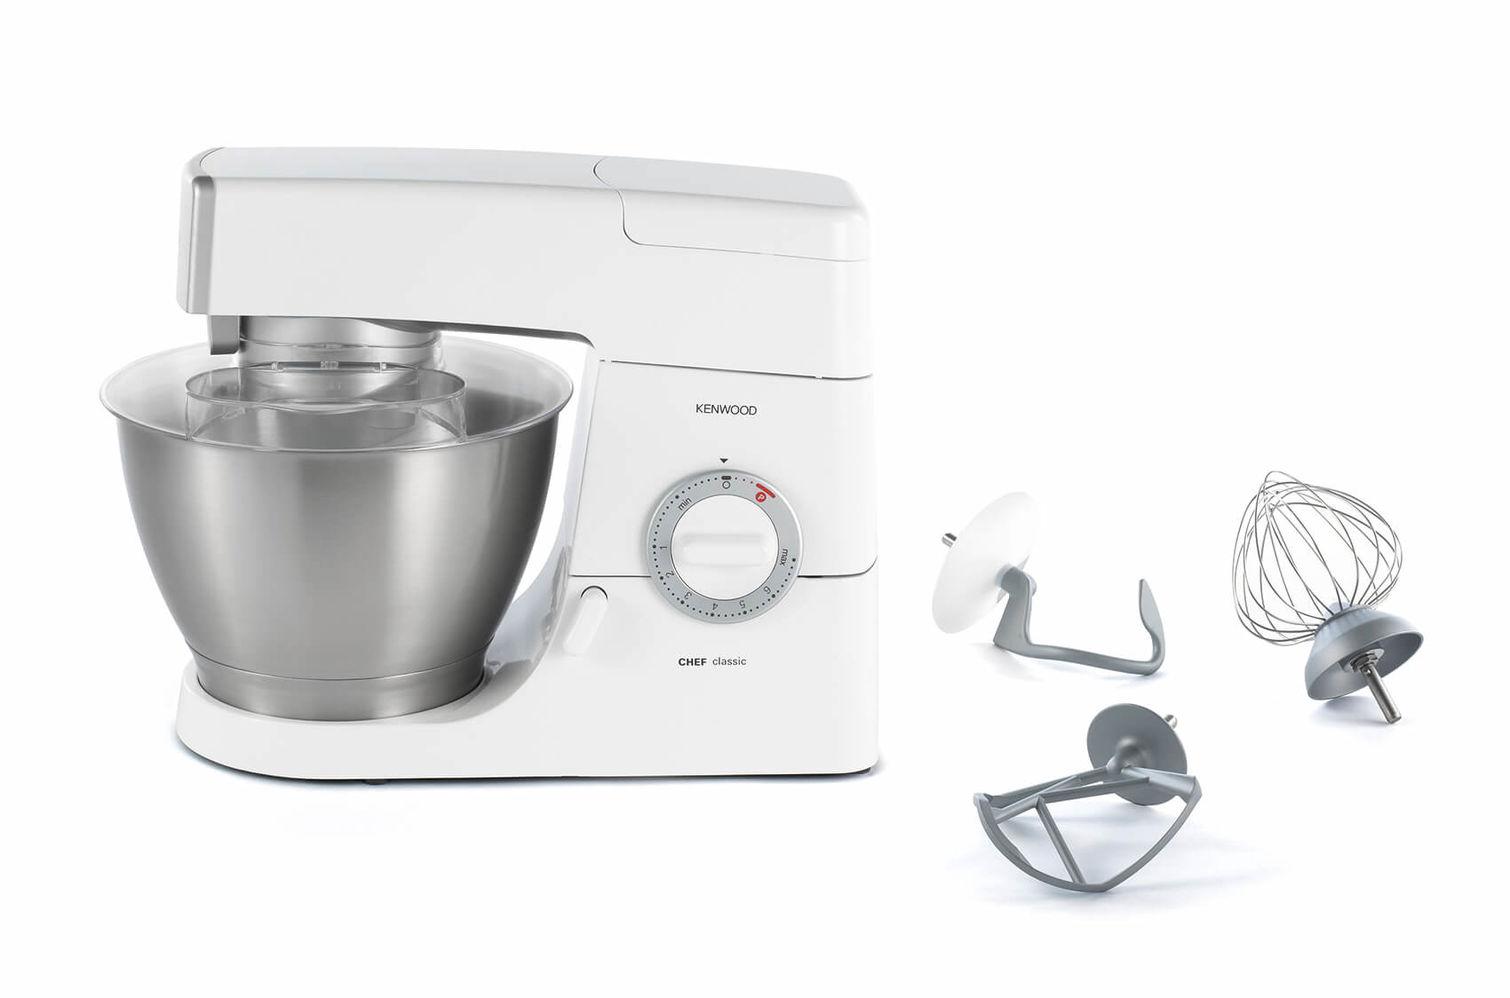 Kenwood Km335 Chef Classic Kitchen Machine